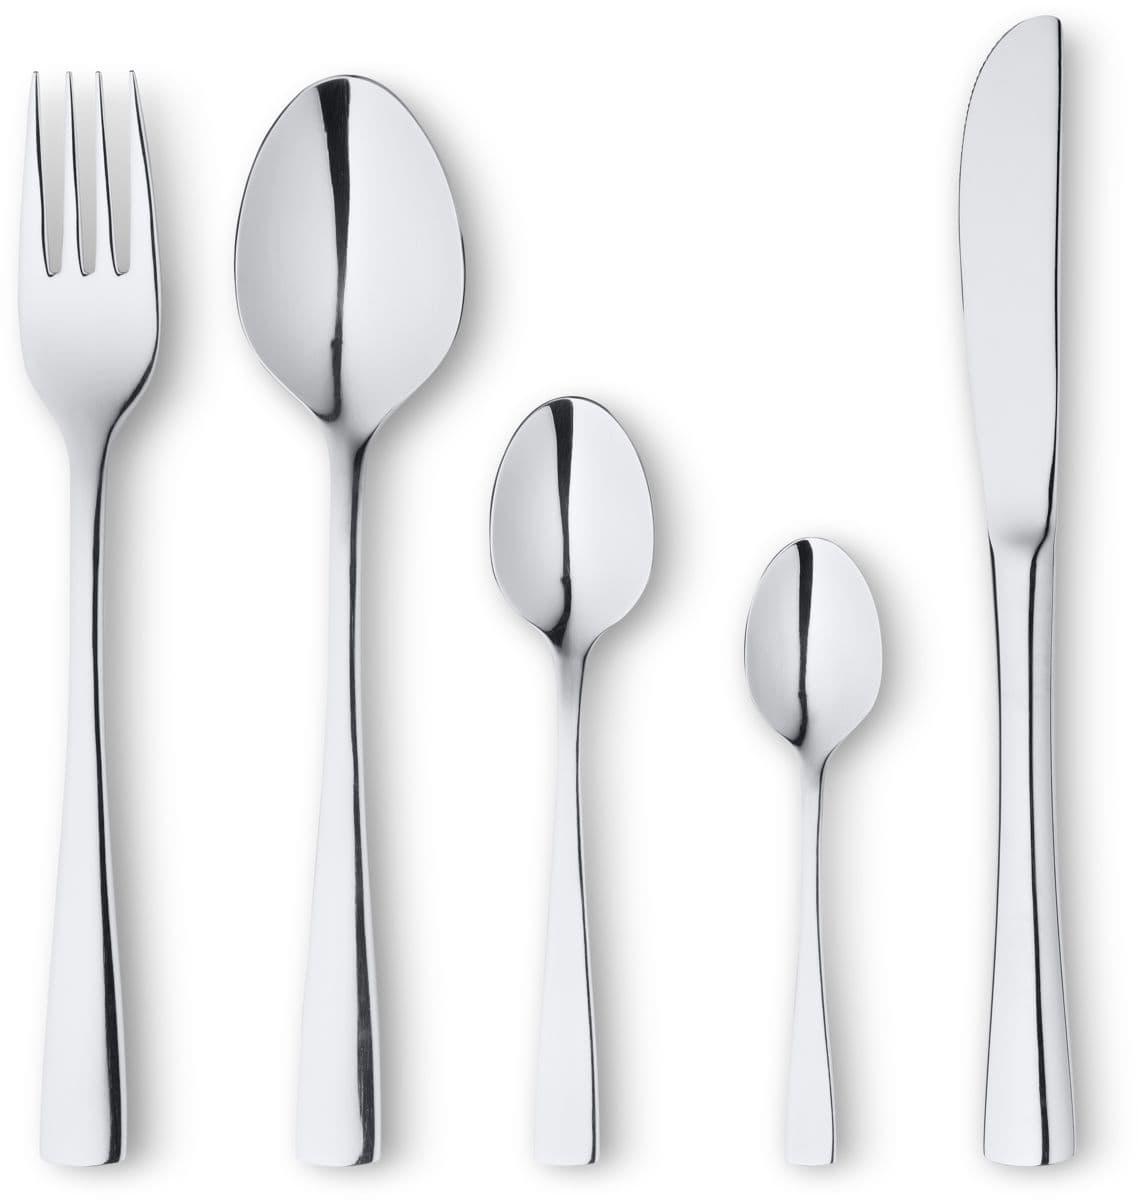 Gesamtes Cucina & Tavola Essbesteck-Sortiment